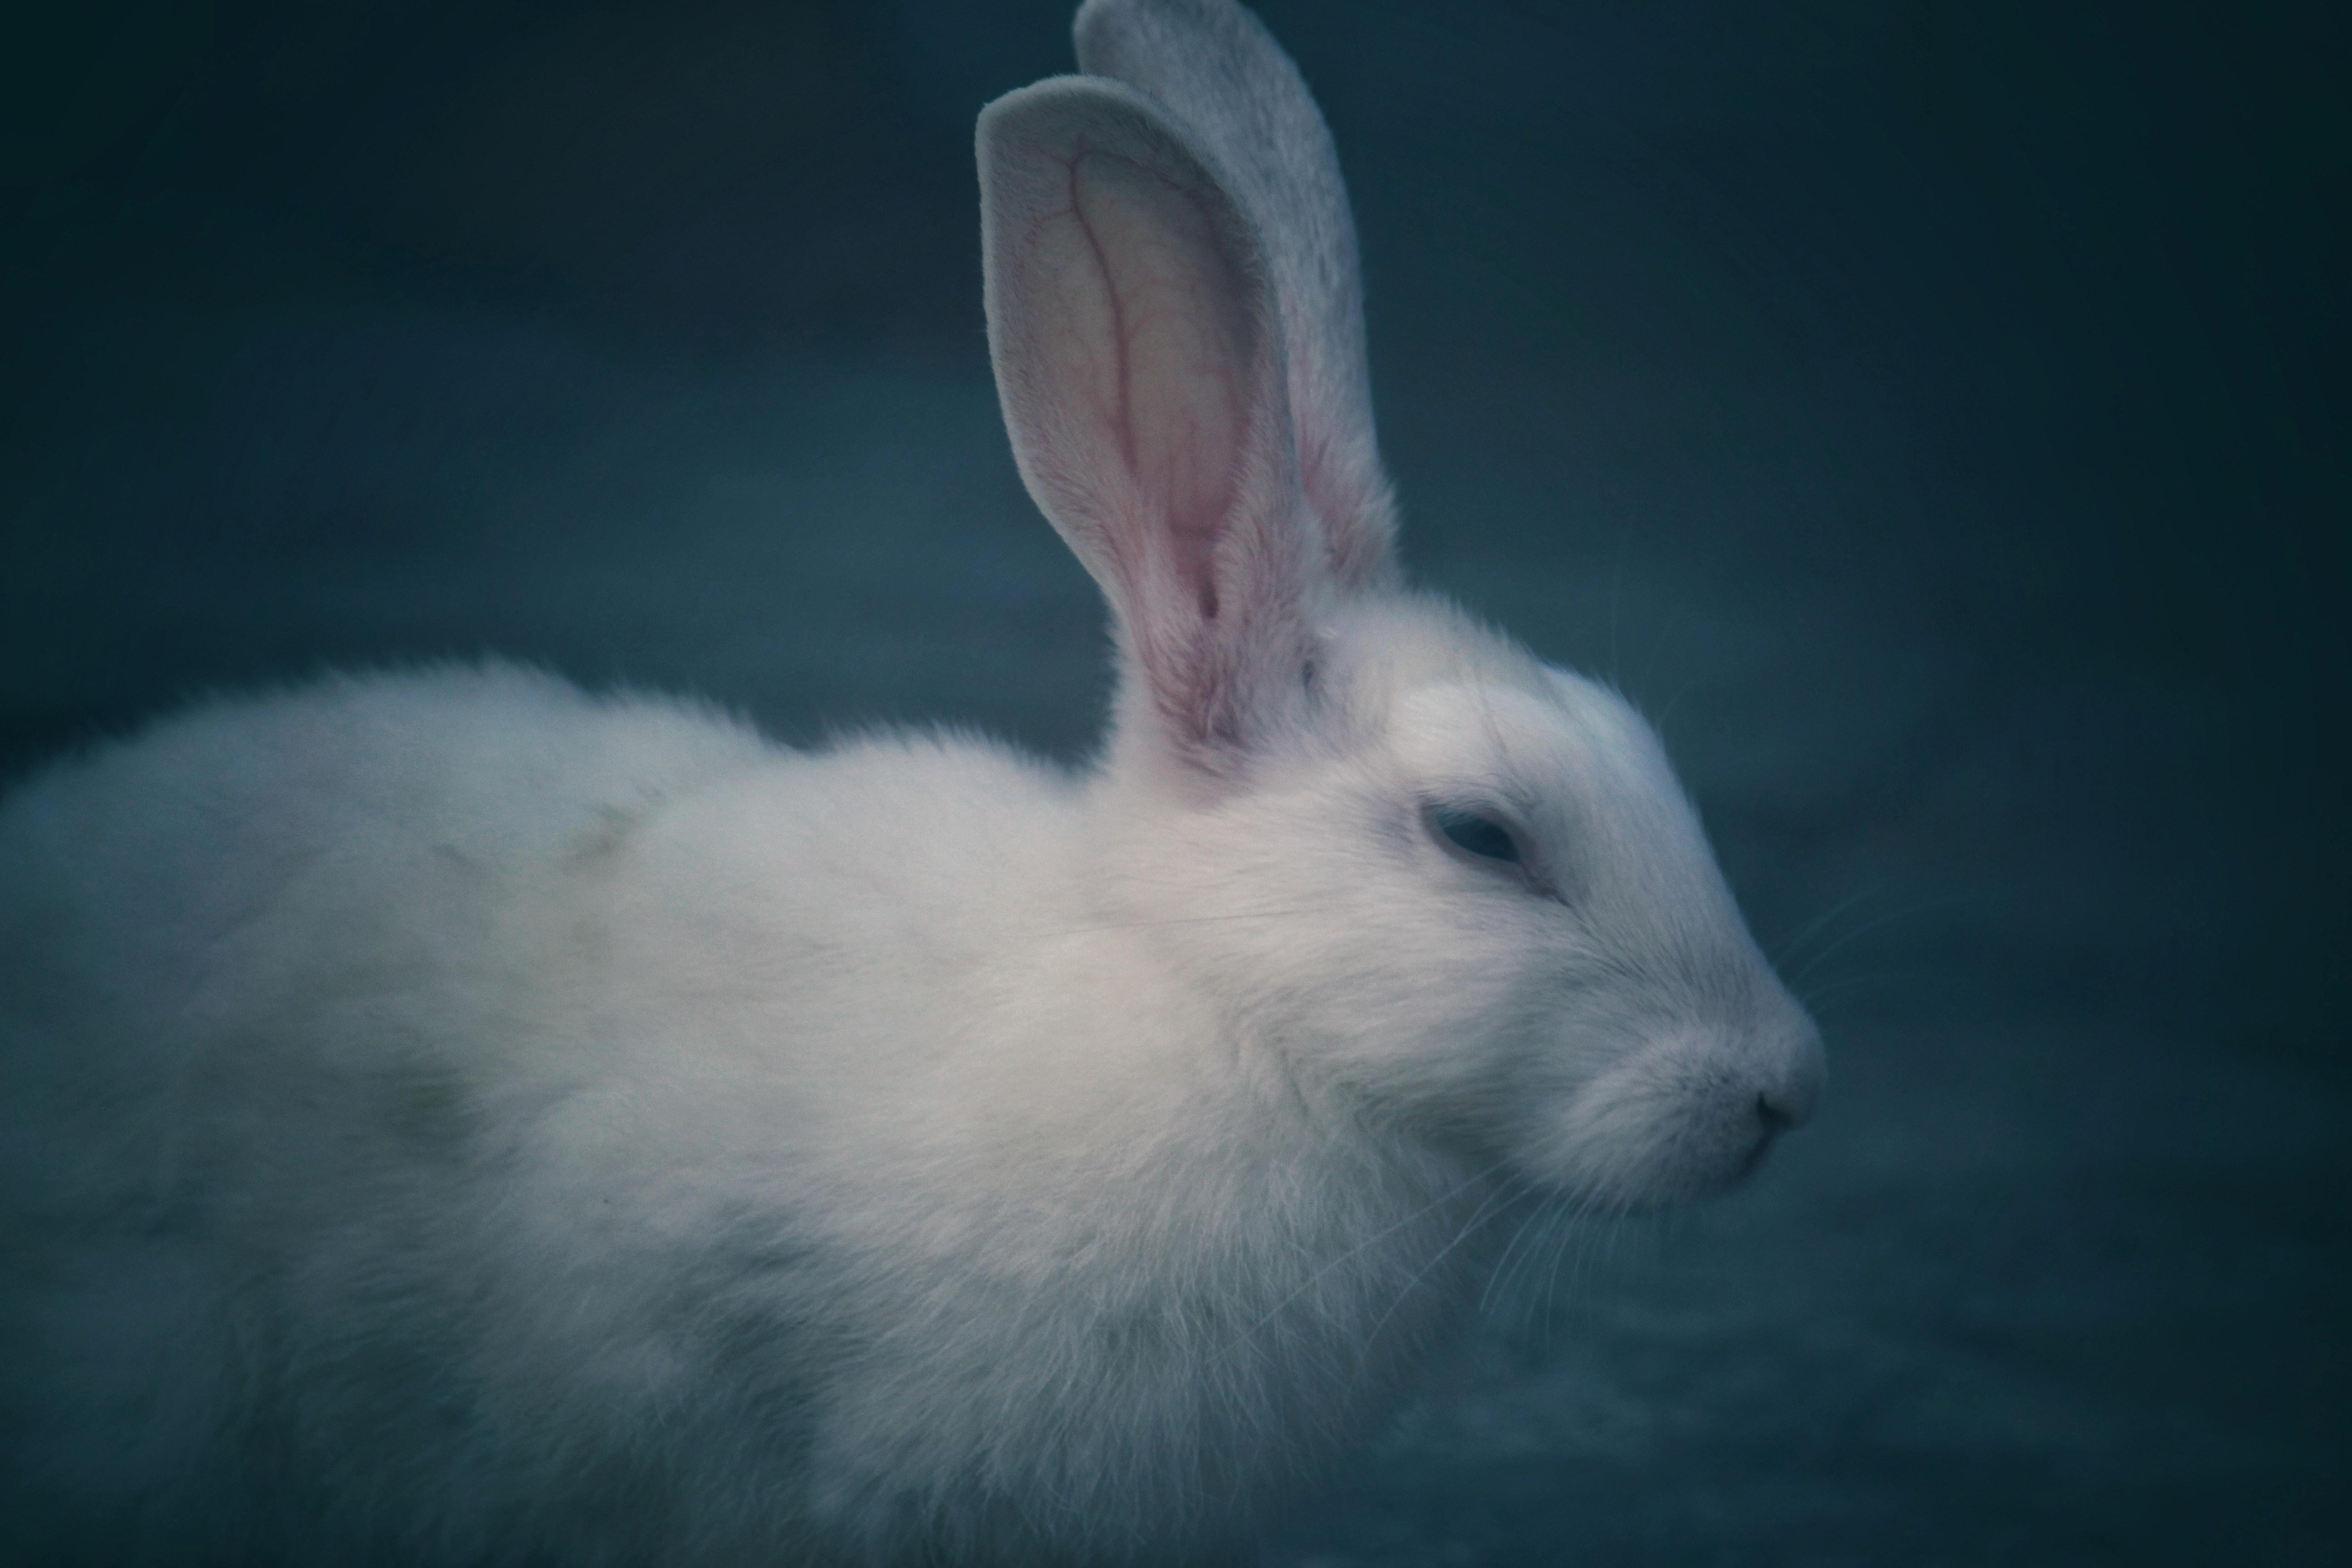 Selective Focus Photography of White Rabbit, Animal, Outdoors, Wild, White, HQ Photo